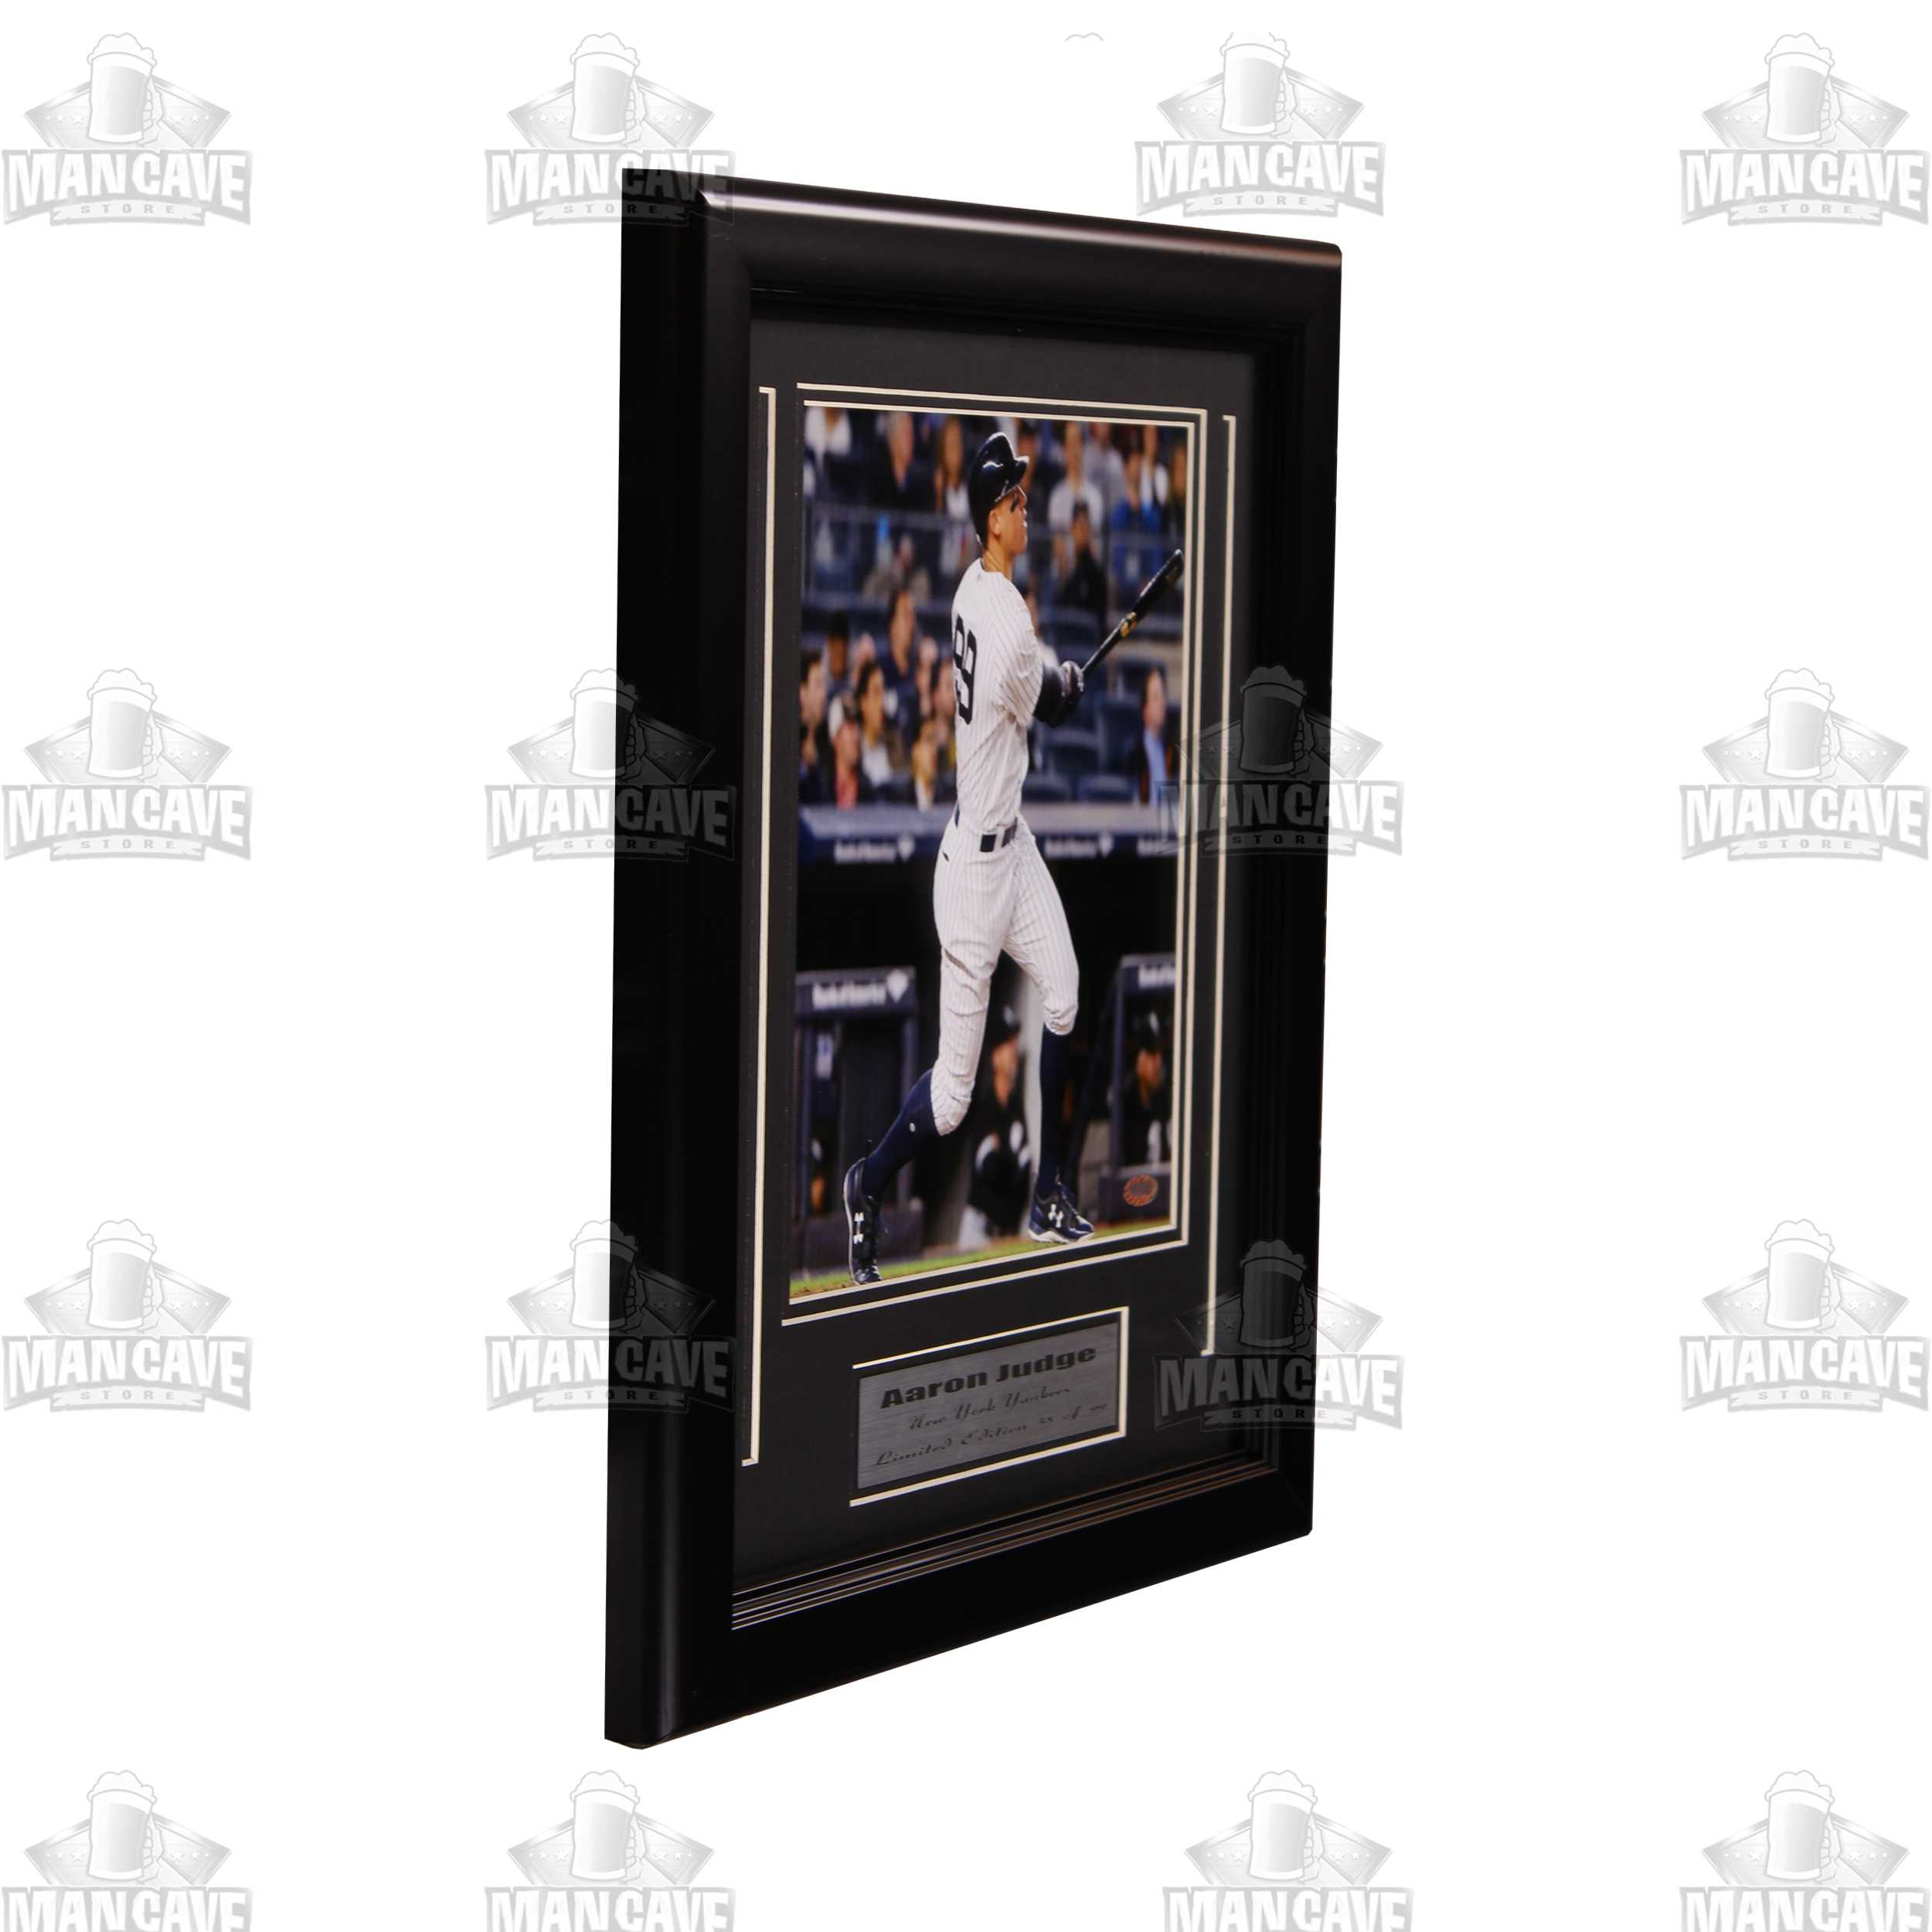 Aaron Judge NY Yankees Small Frame